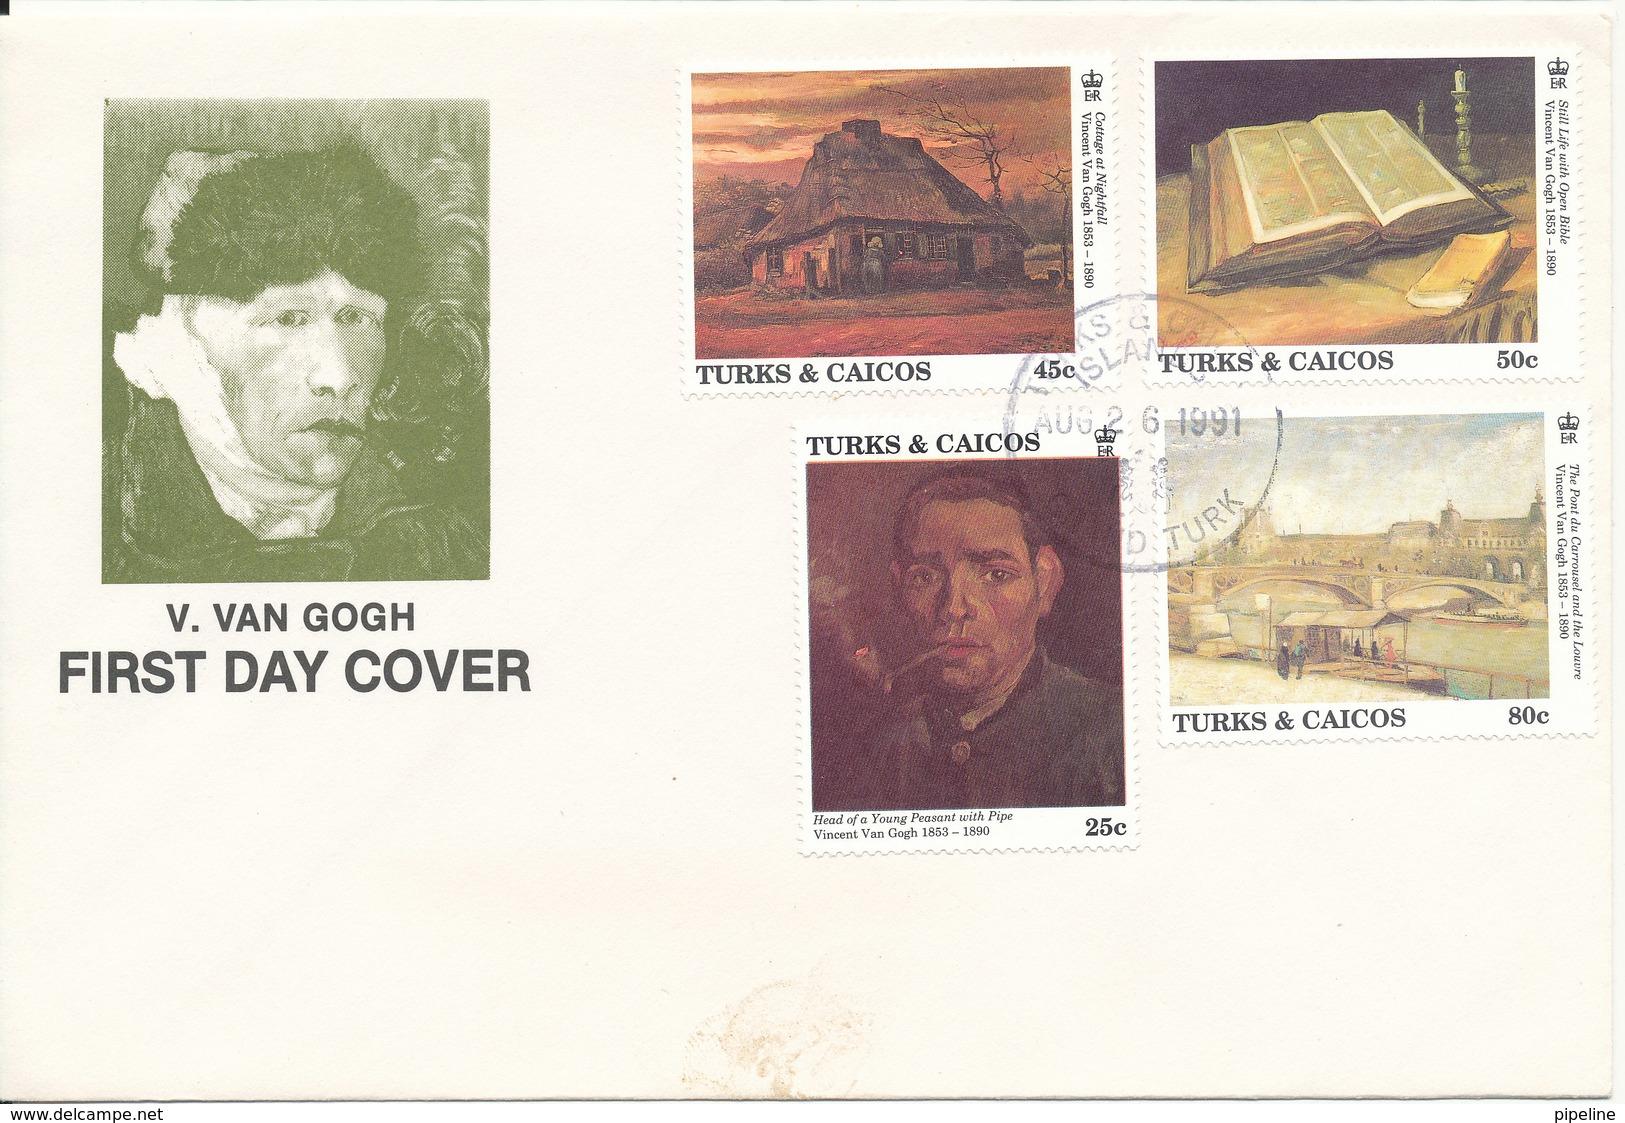 Turks & Caicos FDC 26-8-1991 Vincent Van Gogh ART Painting Set Of 4 With Cachet - Turks & Caicos (I. Turques Et Caïques)